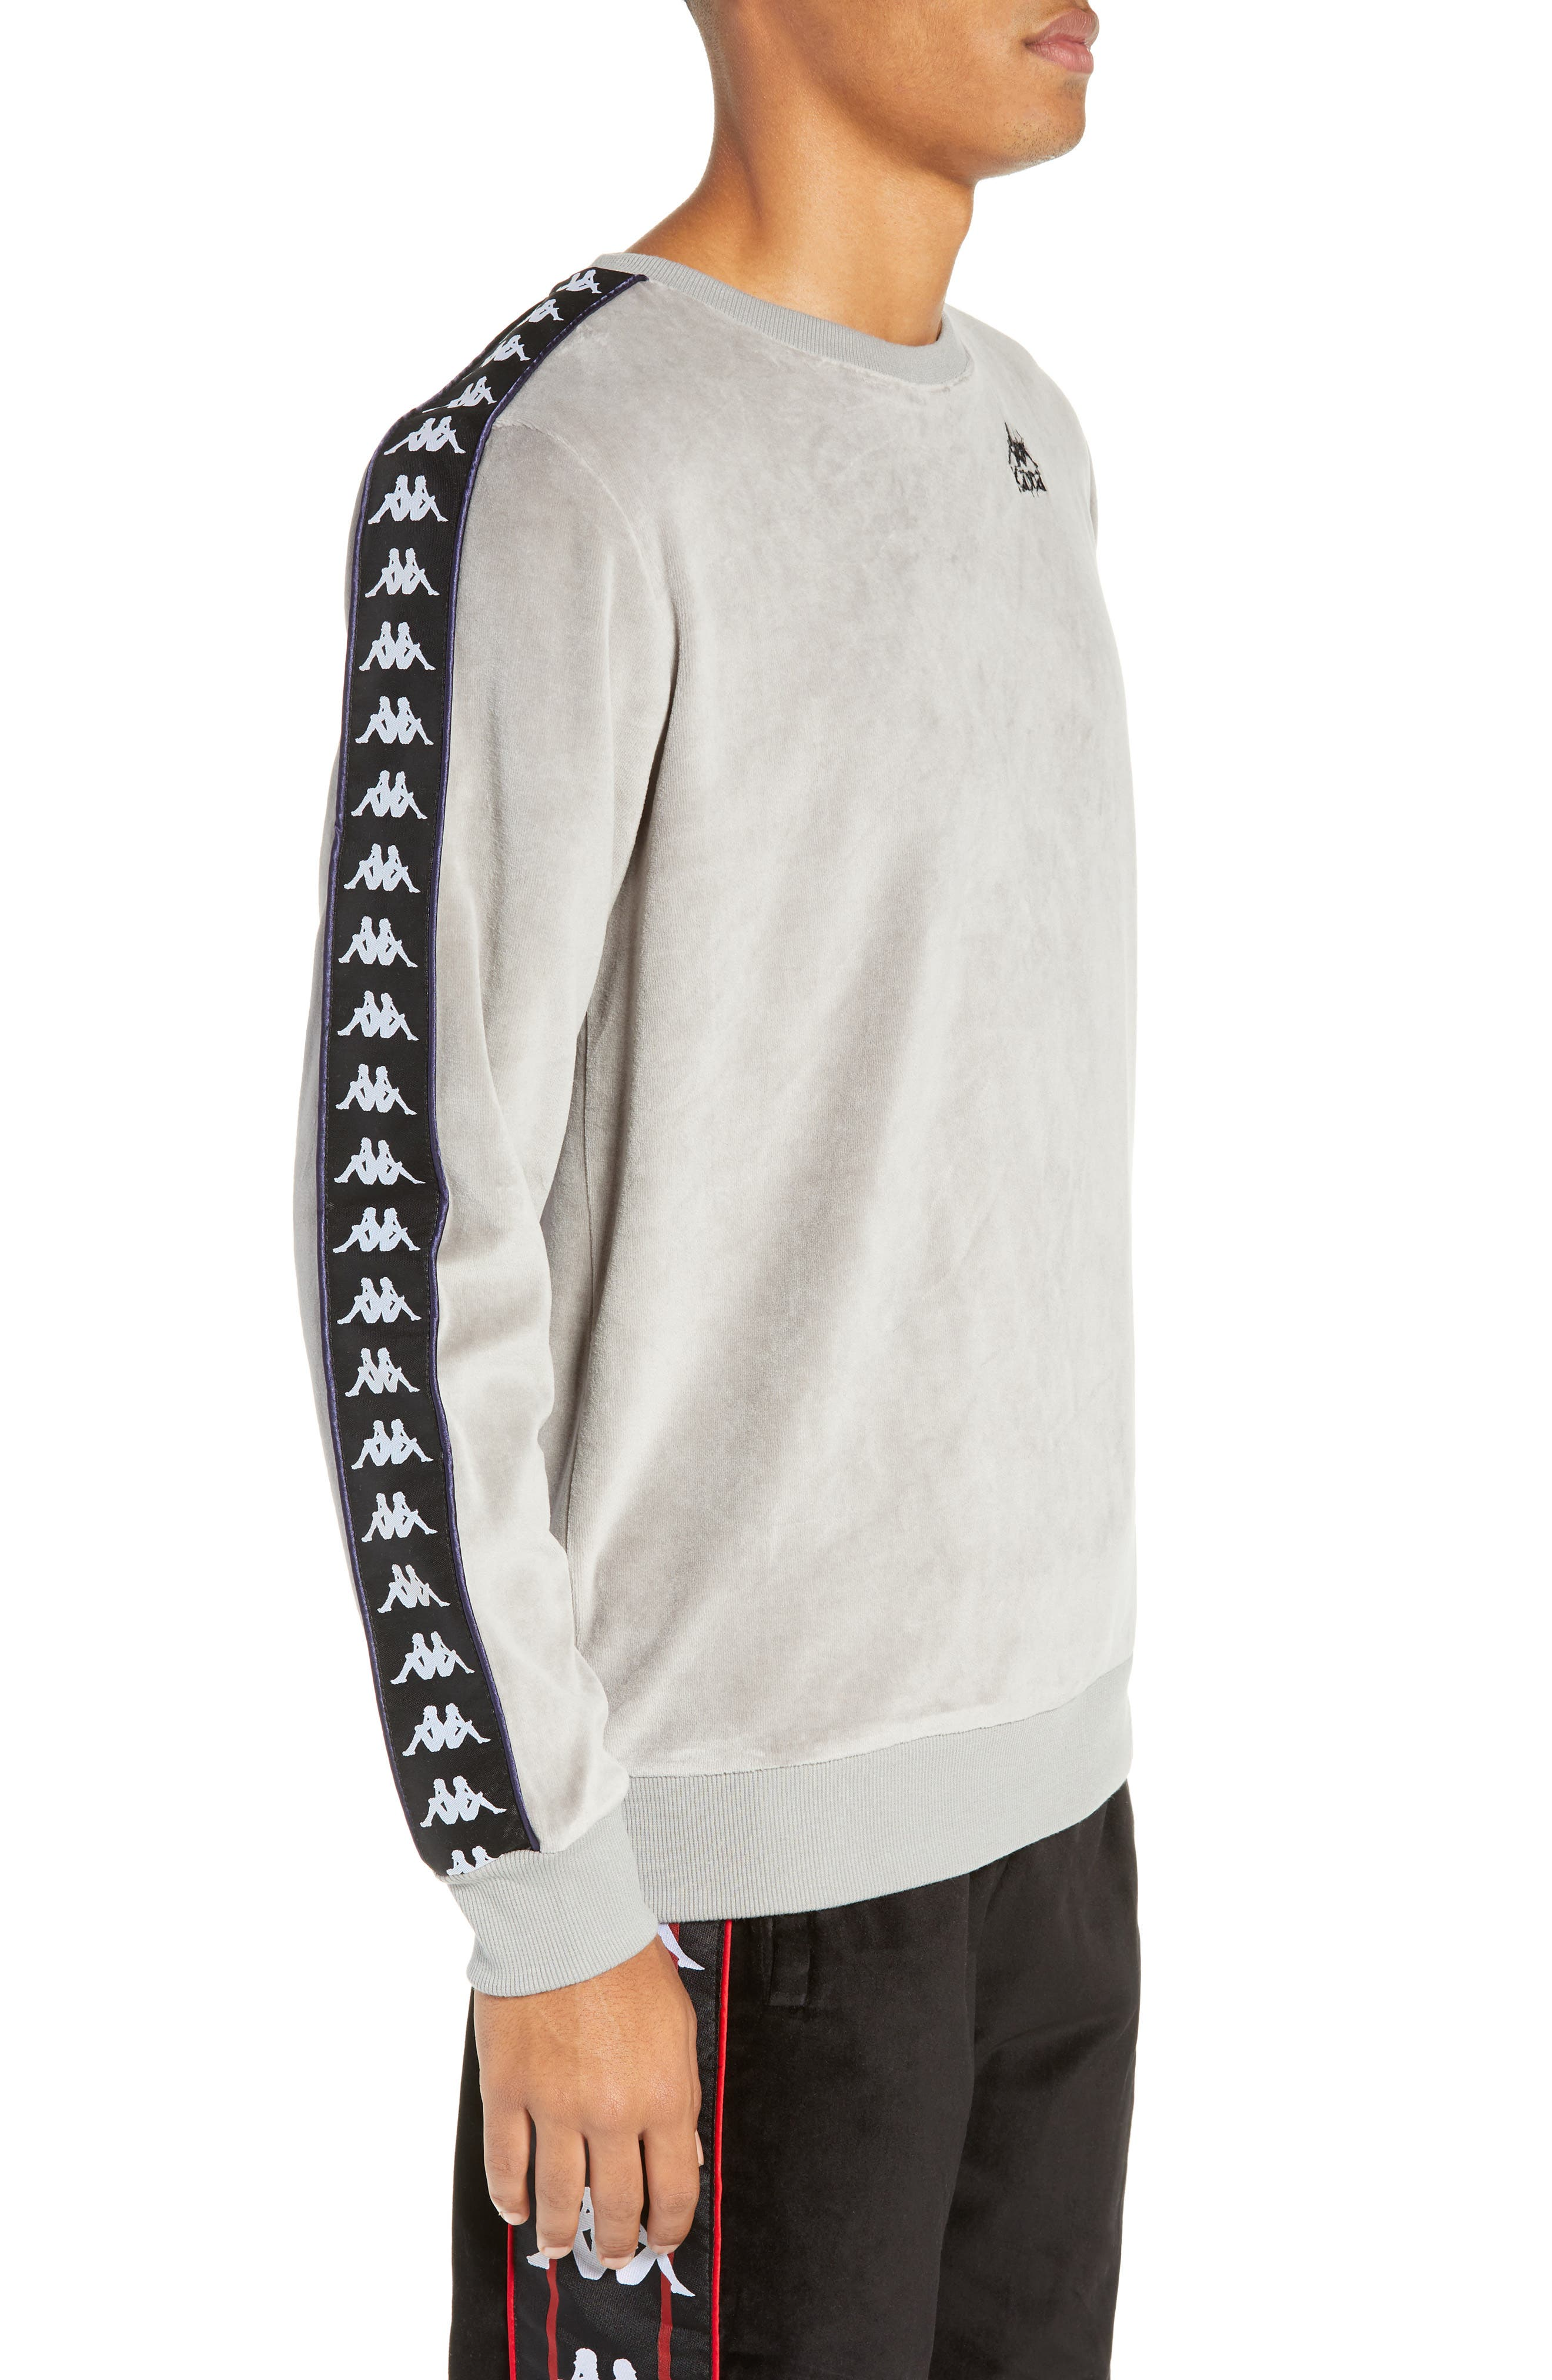 Authentic Aynset Velour Crewneck Sweatshirt,                             Alternate thumbnail 3, color,                             GREY MIST/ BLACK/ WHITE